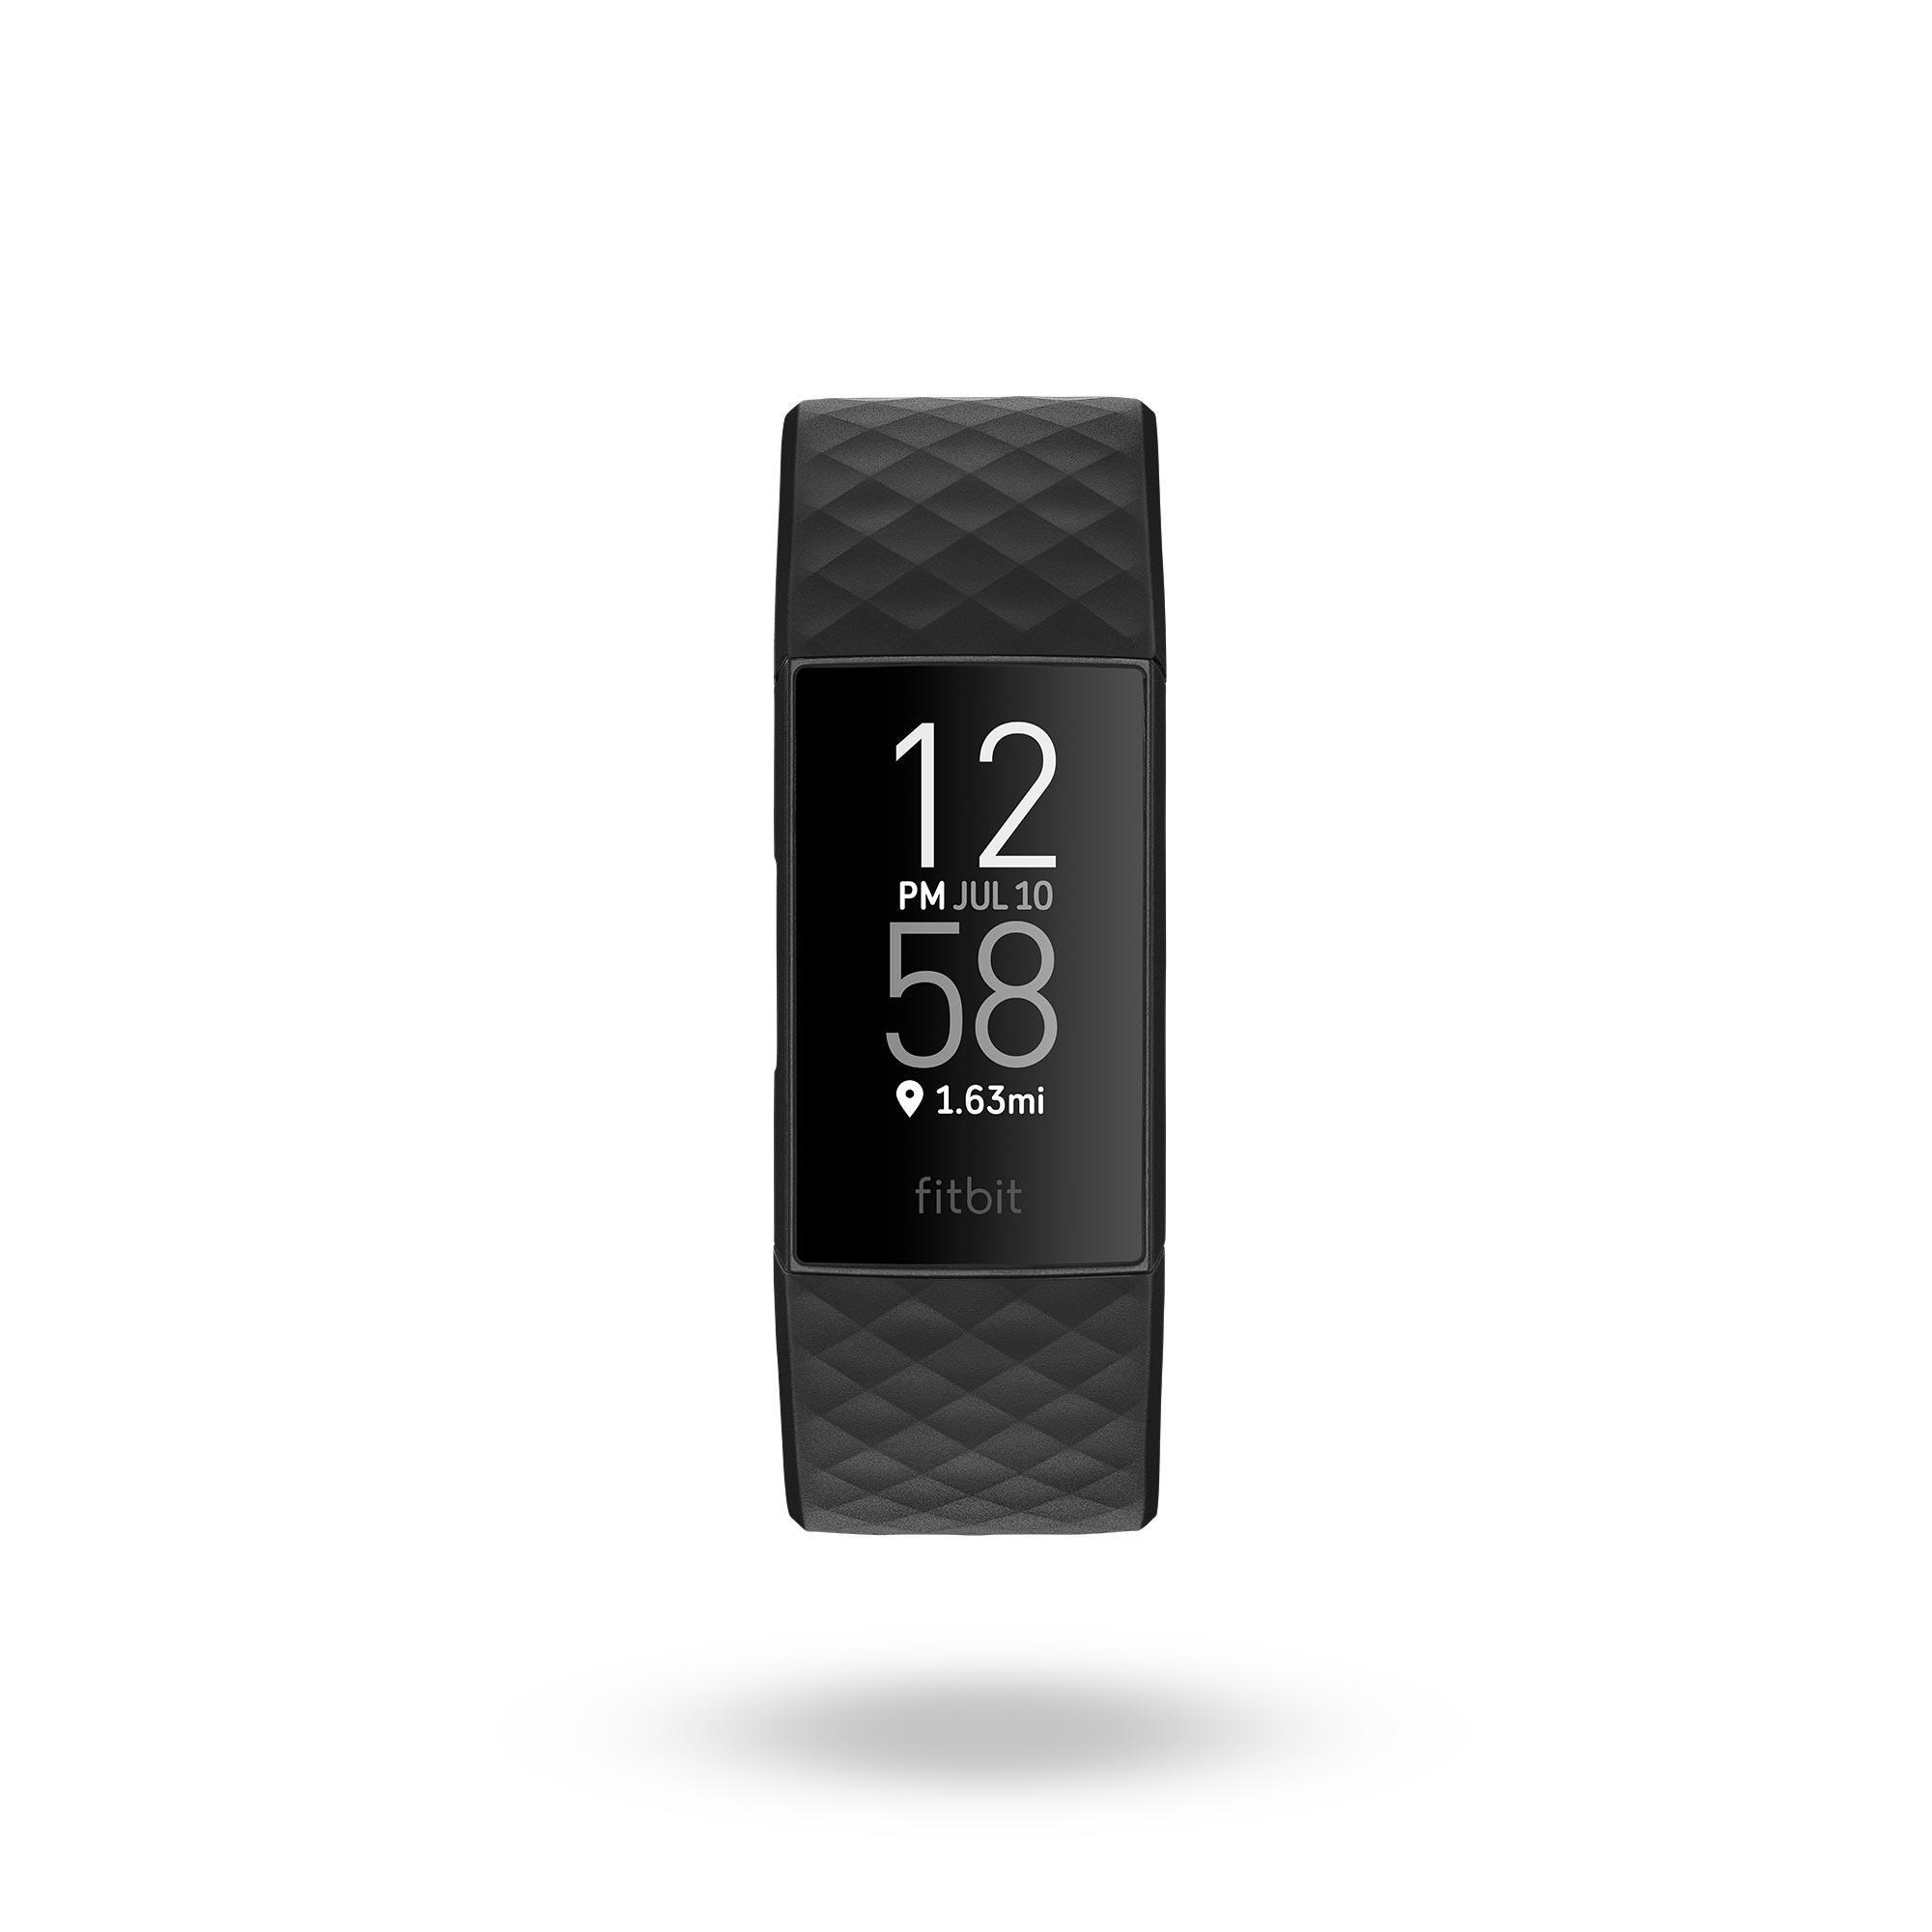 Fitnessarmband Charge 4 schwarz | Schmuck > Armbänder > Fitness-Armbänder | Fitbit